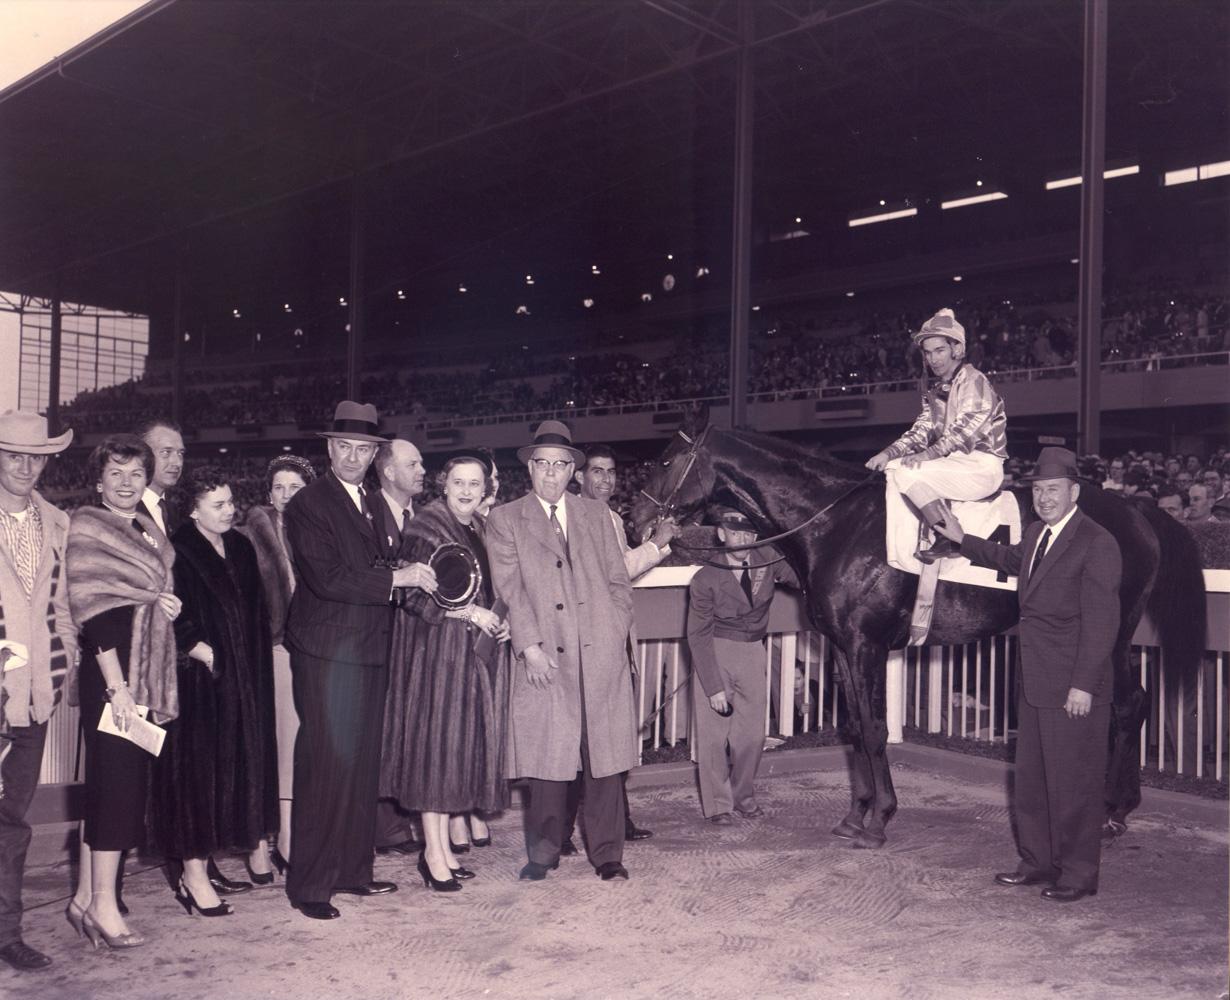 Round Table (Bill Shoemaker up) in the winner's circle for the 1958 San Fernando Stakes at Santa Anita Park (Santa Anita Photo/Museum Collection)